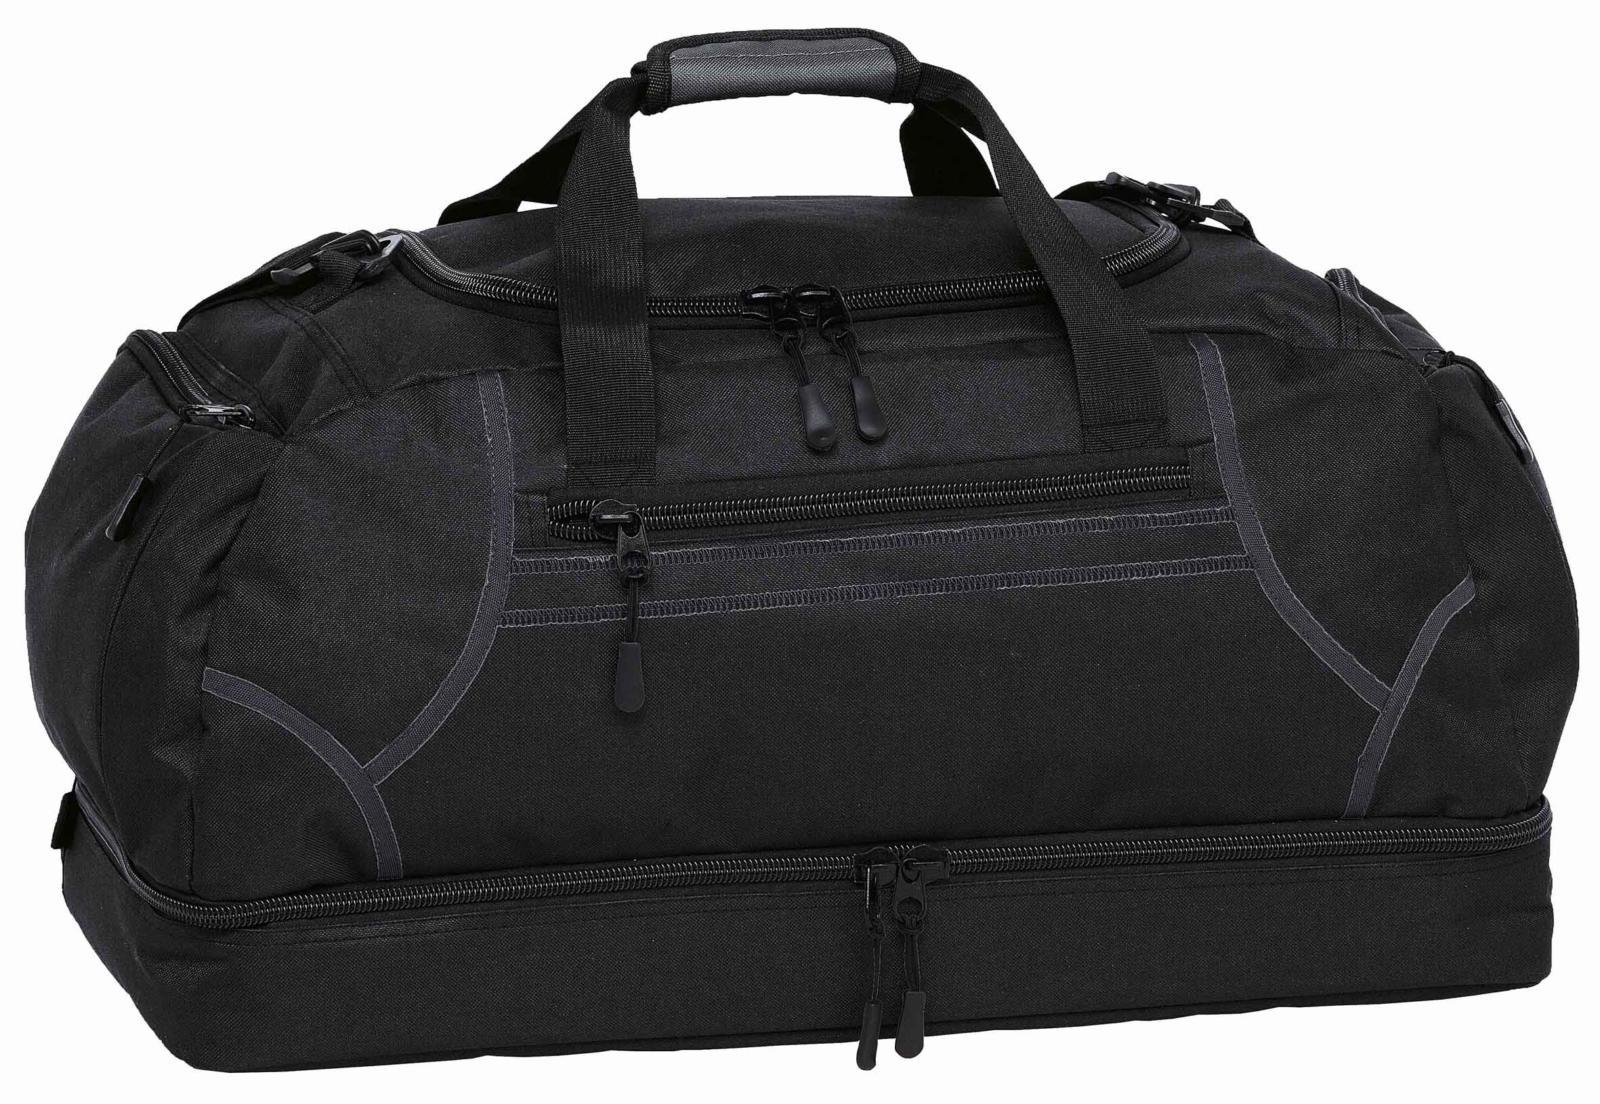 Reflex Sports Bag